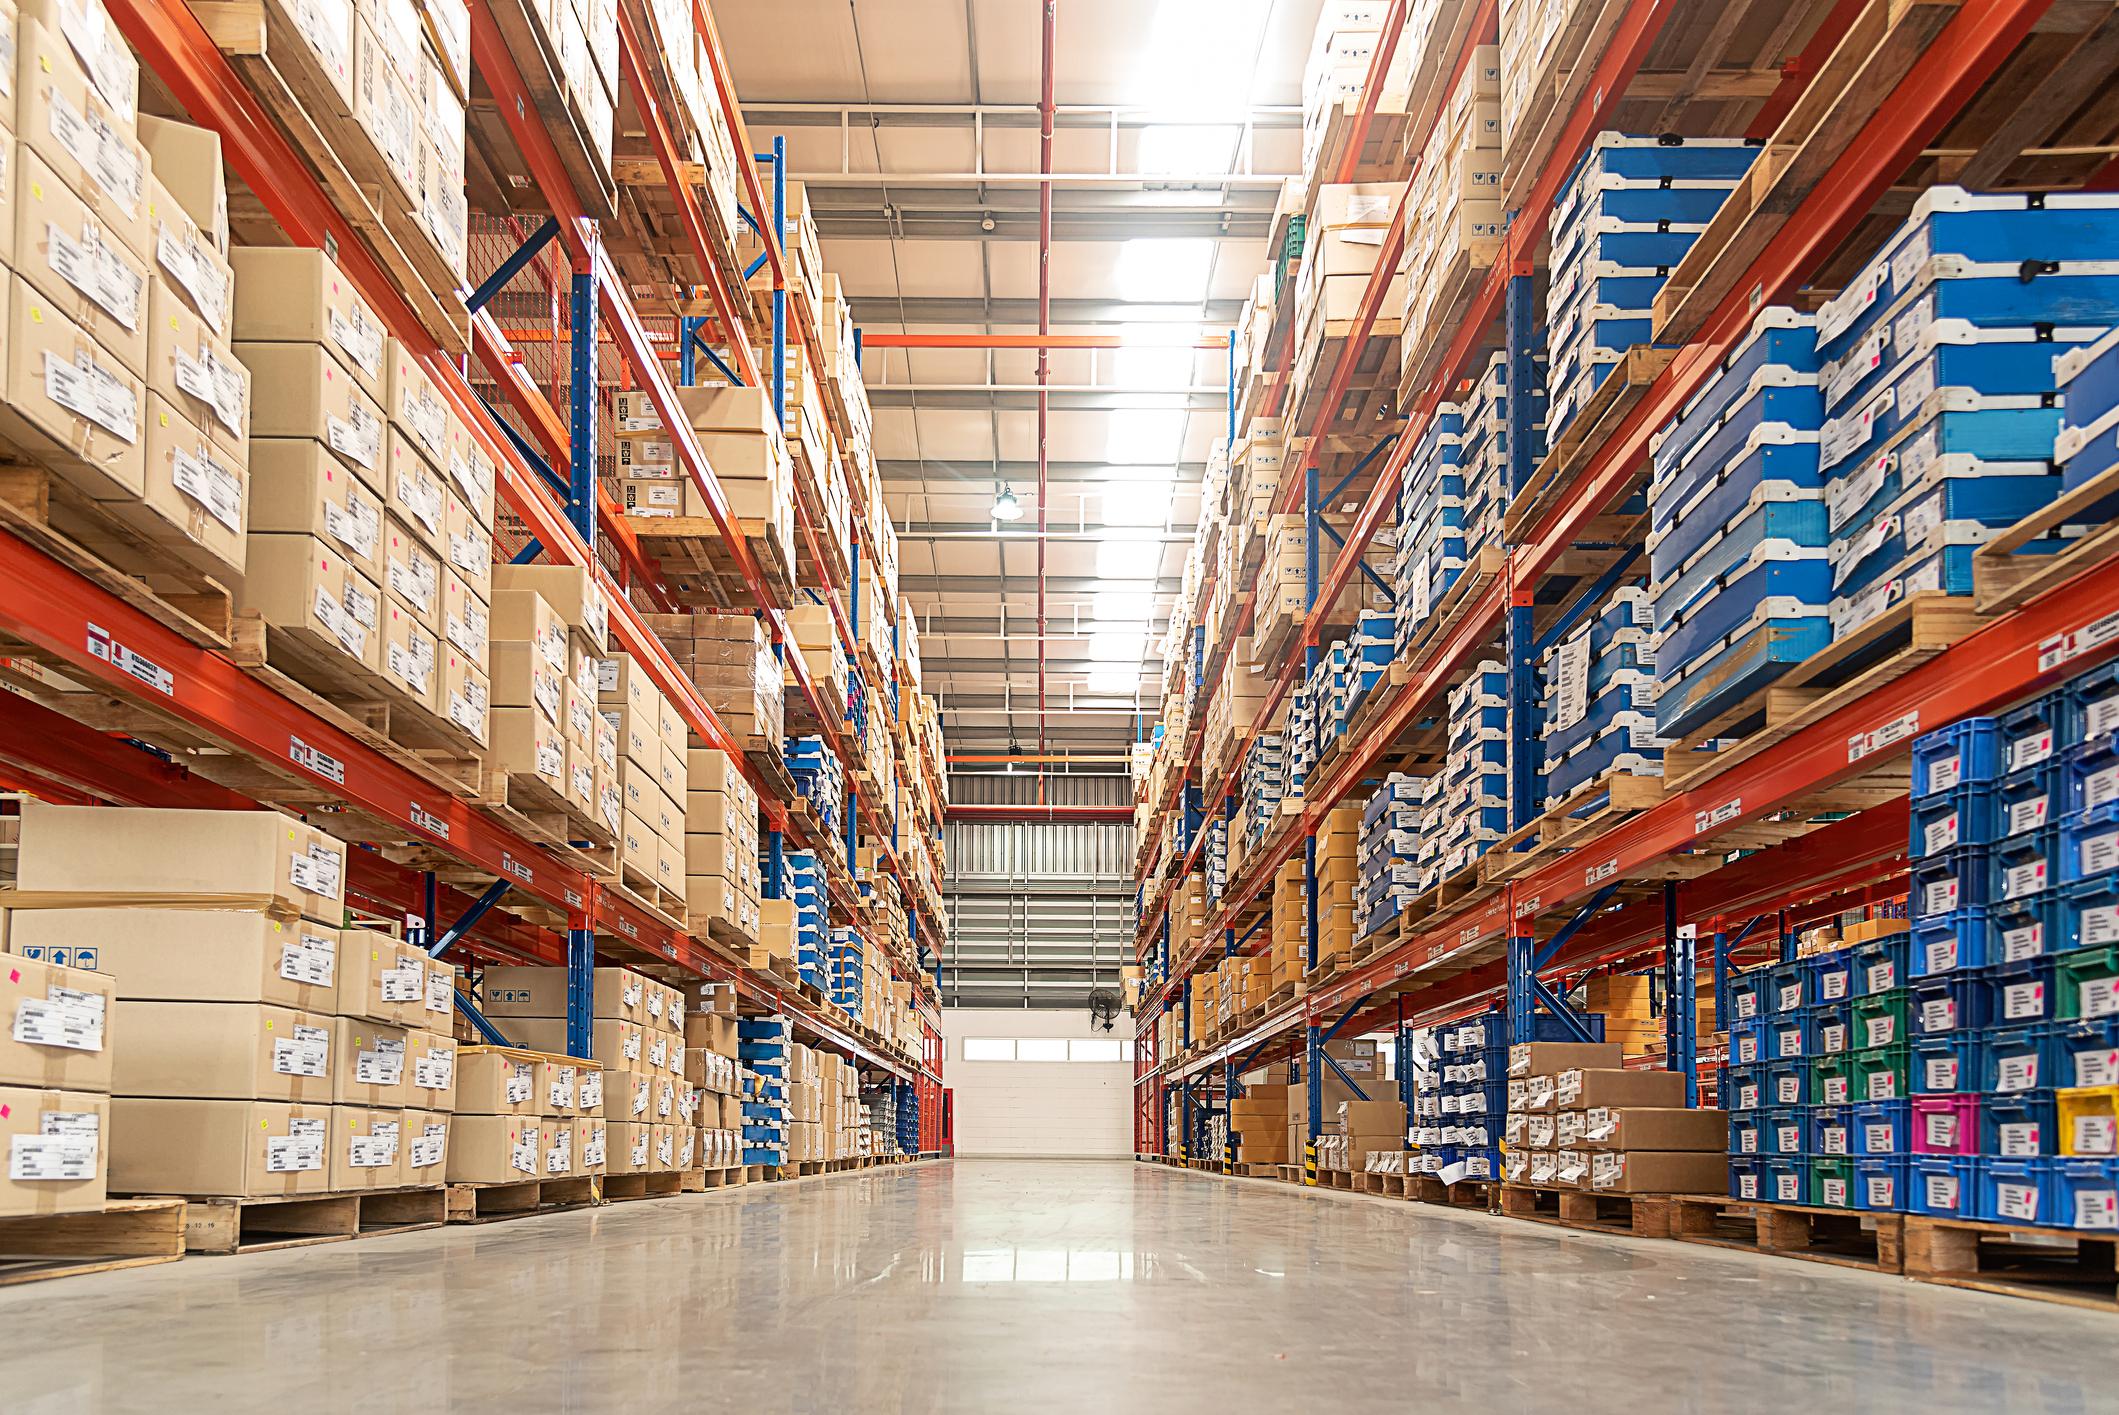 Warehouse Shelving | Warehouse Racking | Speedrack West